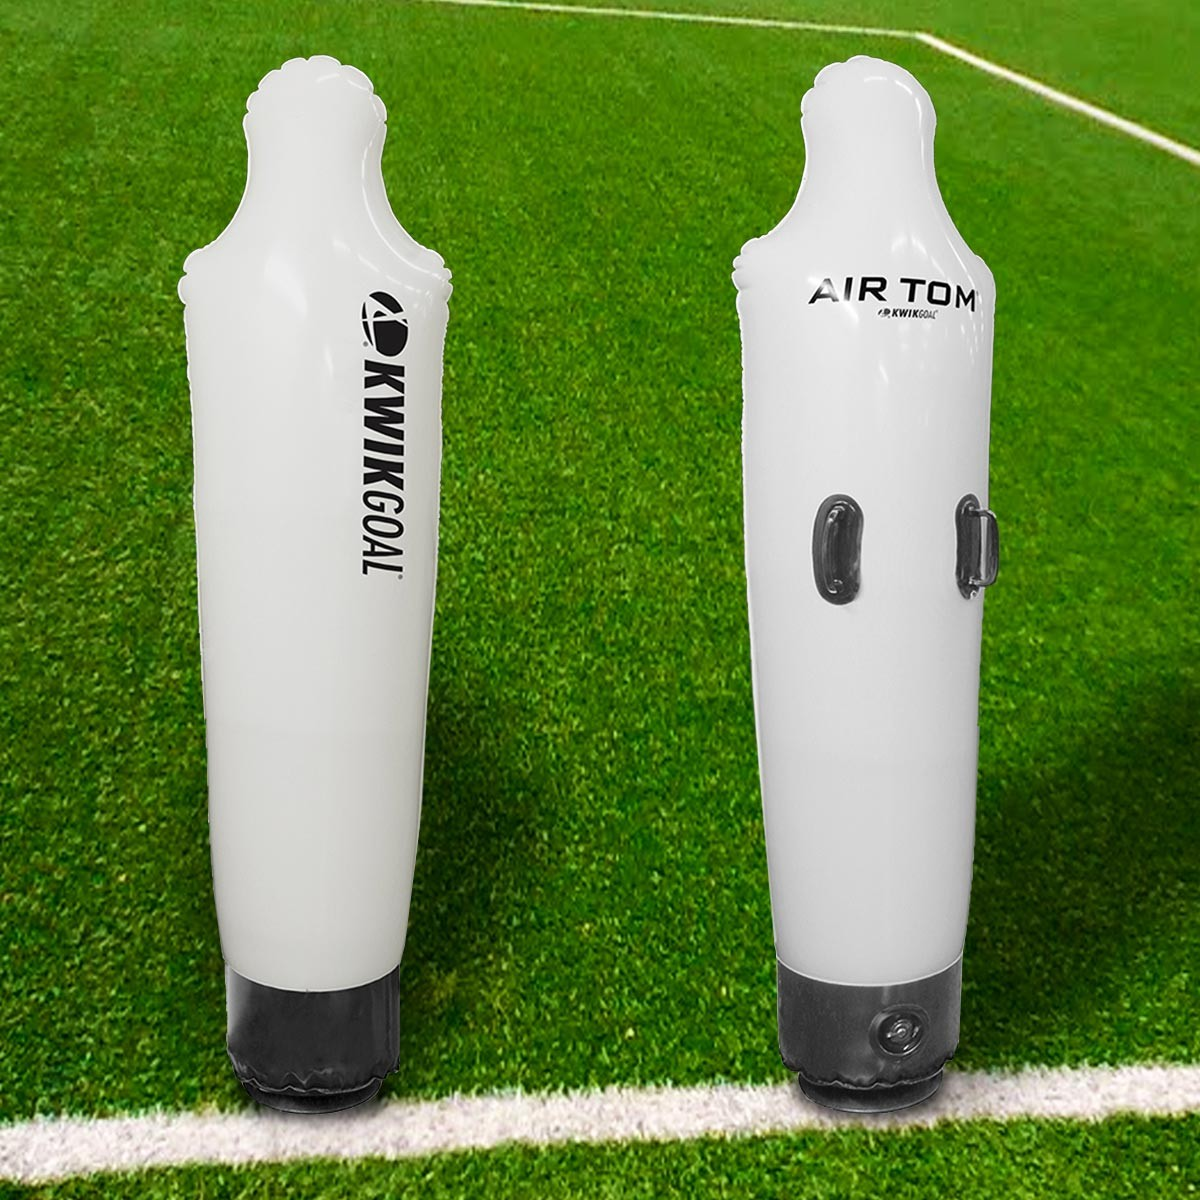 Kwik Goal Air Tom Soccer Training Mannequin 16b3702 A12